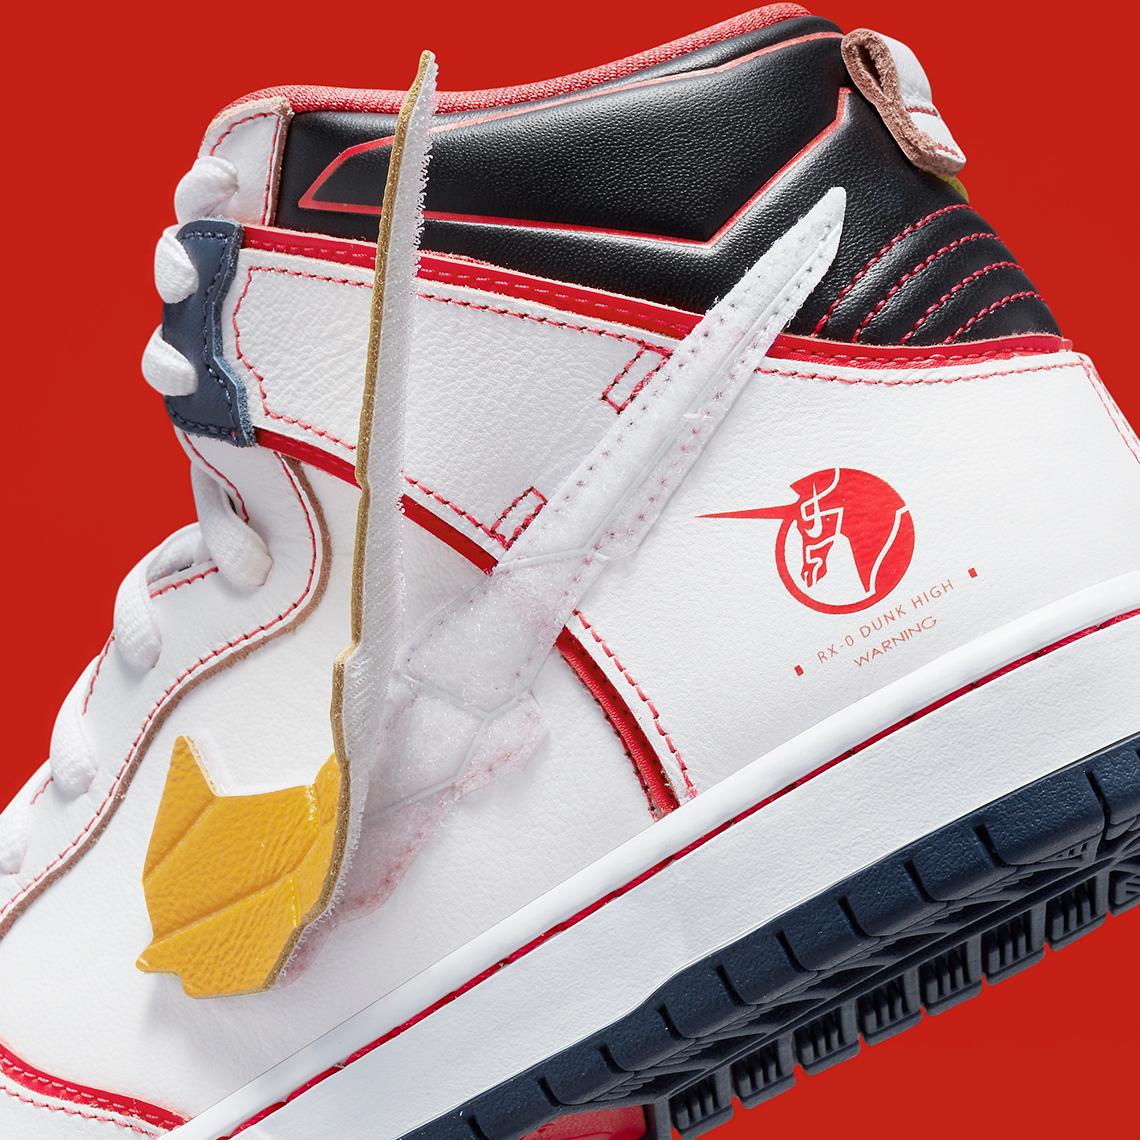 Gundam x Nike SB Dunk High ''RX-0 Unicorn'' - DH7717-100